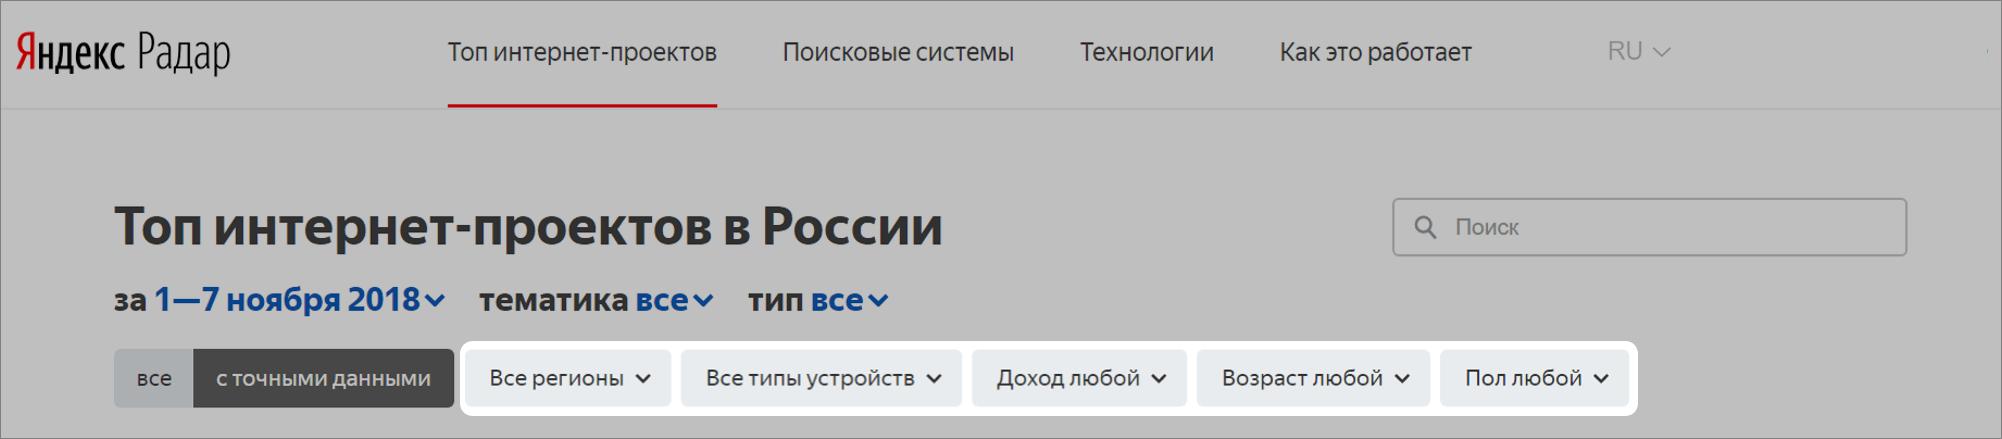 Метрики в Яндекс Радаре